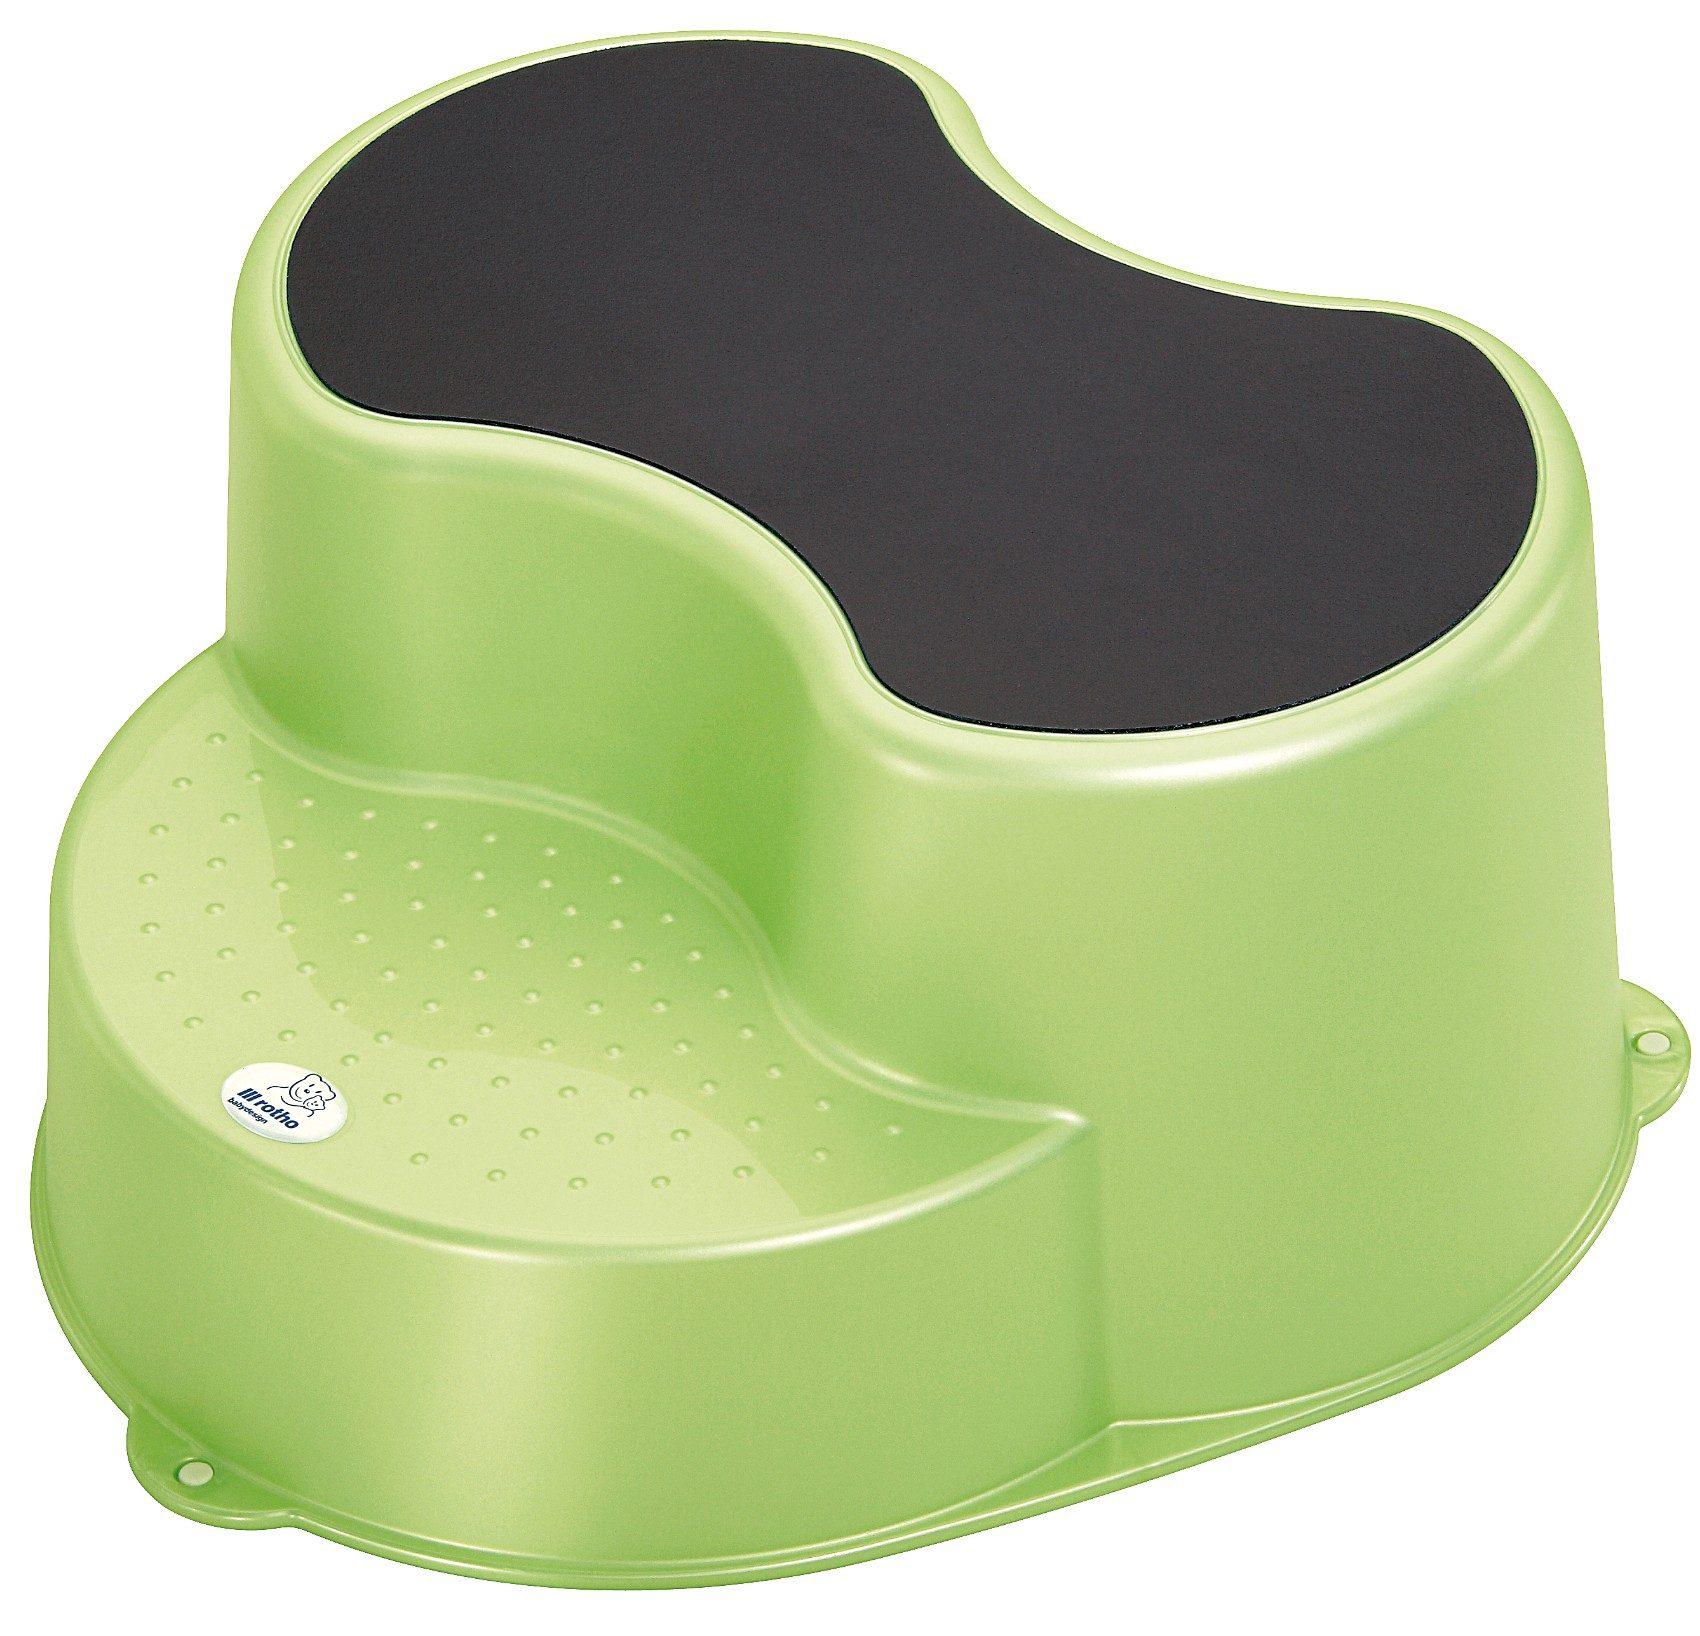 Rotho Babydesign Trittschemel Top, lindgrün perl